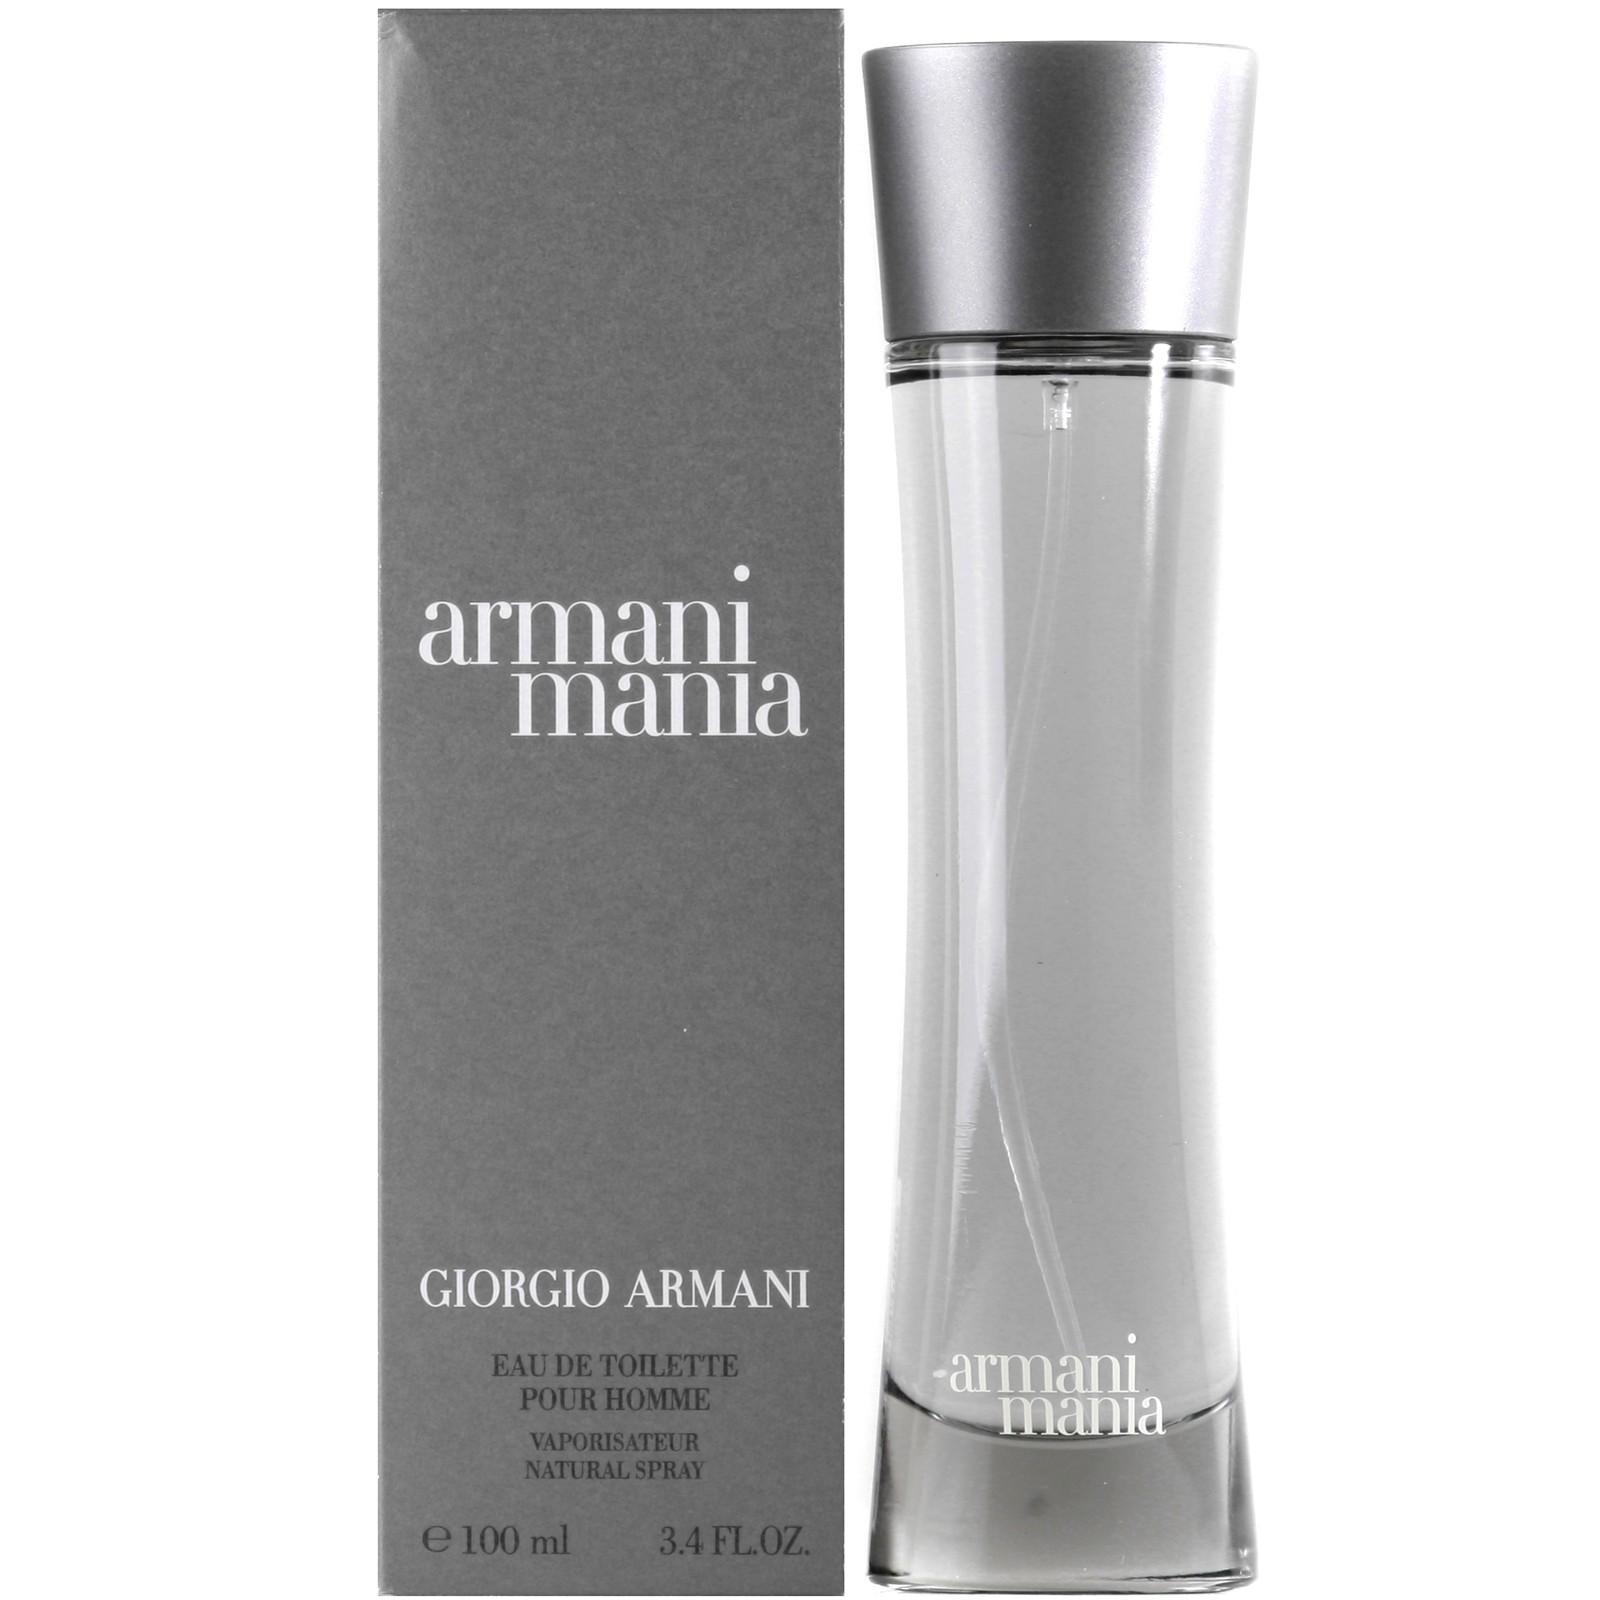 ARMANI MANIA 100ml EDT